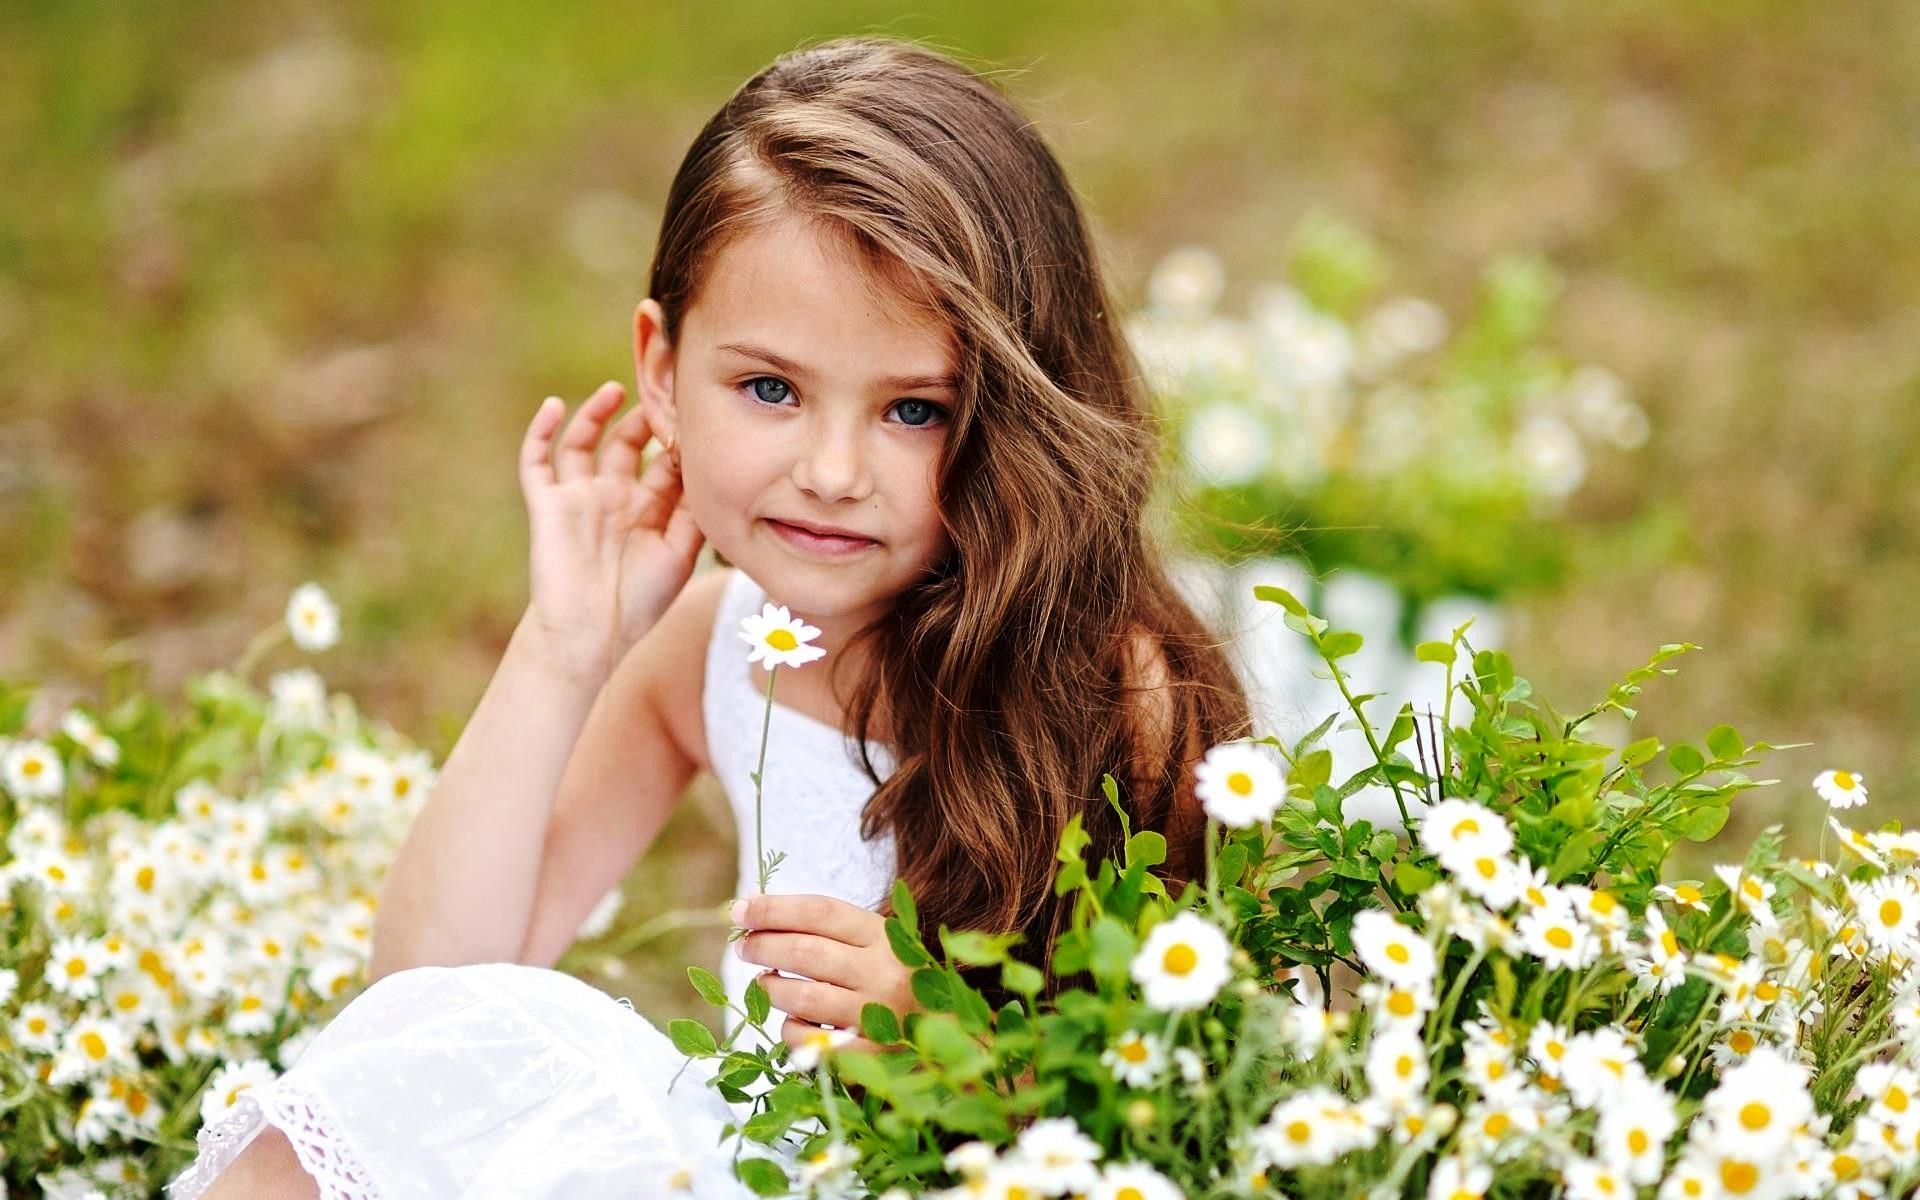 بالصور فتيات جميلات , صور بنات اطفال يجننوا 4374